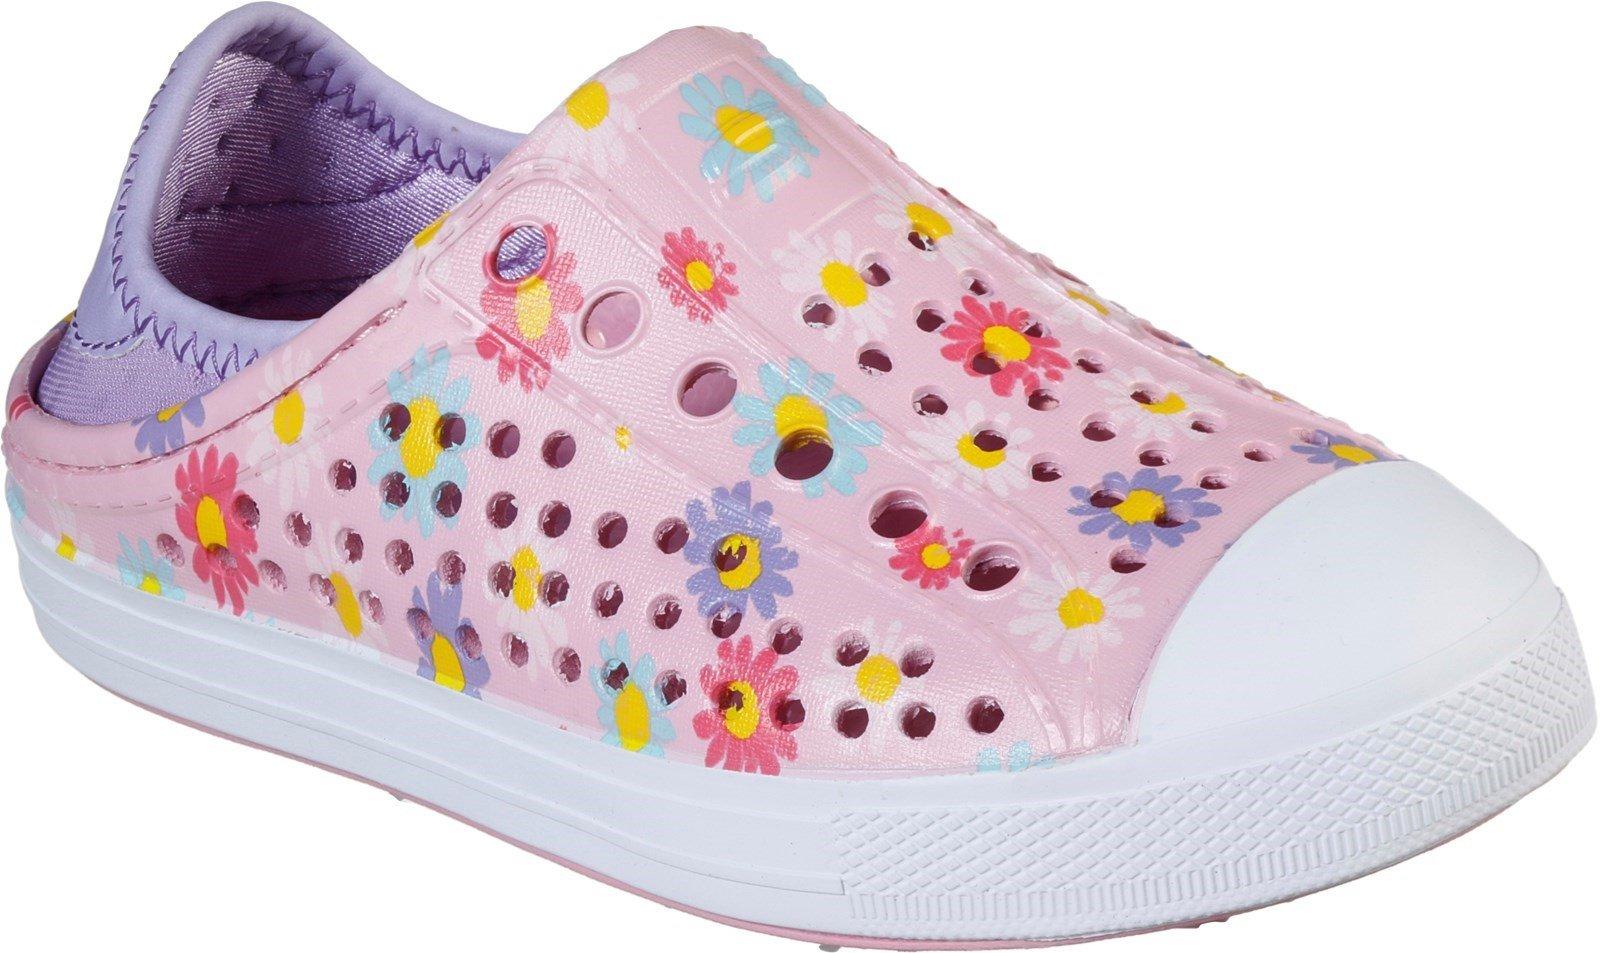 Skechers Unisex Guzman Steps Hello Daisy Slip On Sandal Pink 30780 - Pink 4